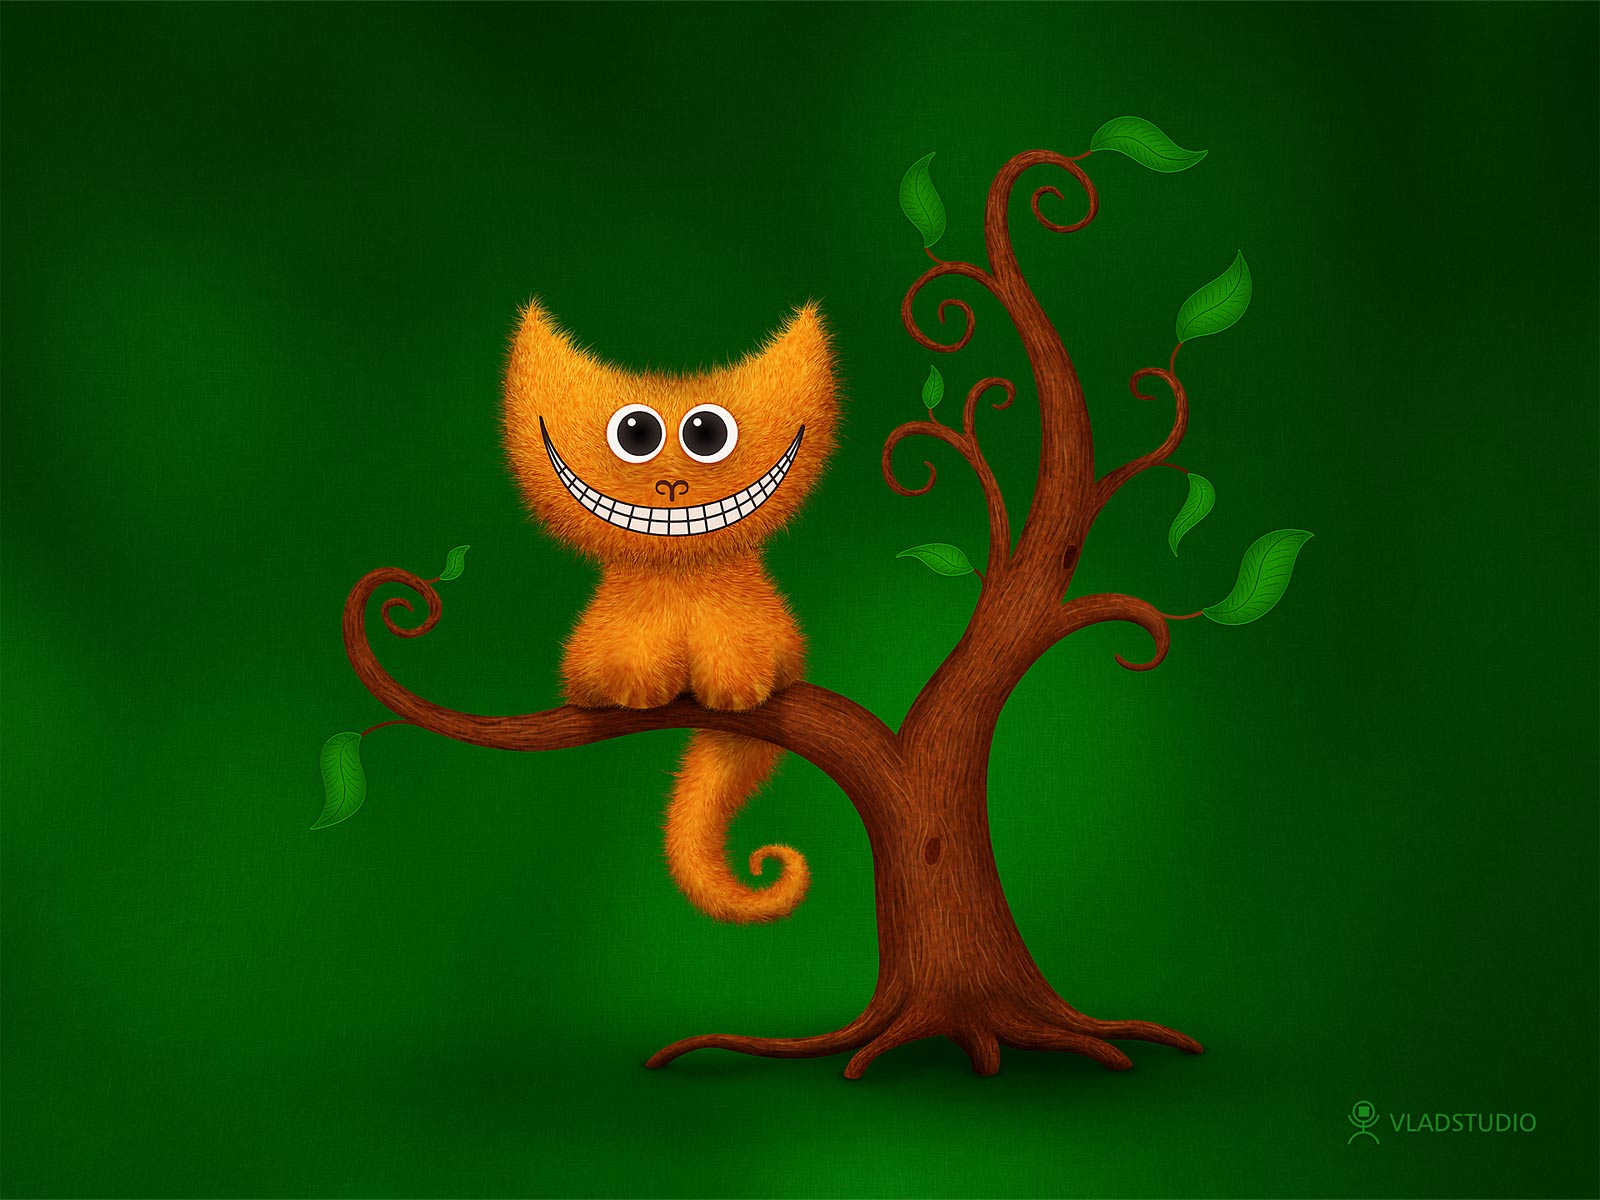 http://3.bp.blogspot.com/_vQwn4lAq9j0/TUhjOFrokvI/AAAAAAAAAHc/mFWcgfunP10/s1600/a-cheshire-kitten-fullscreen-wallpaper-1600x1200.jpg